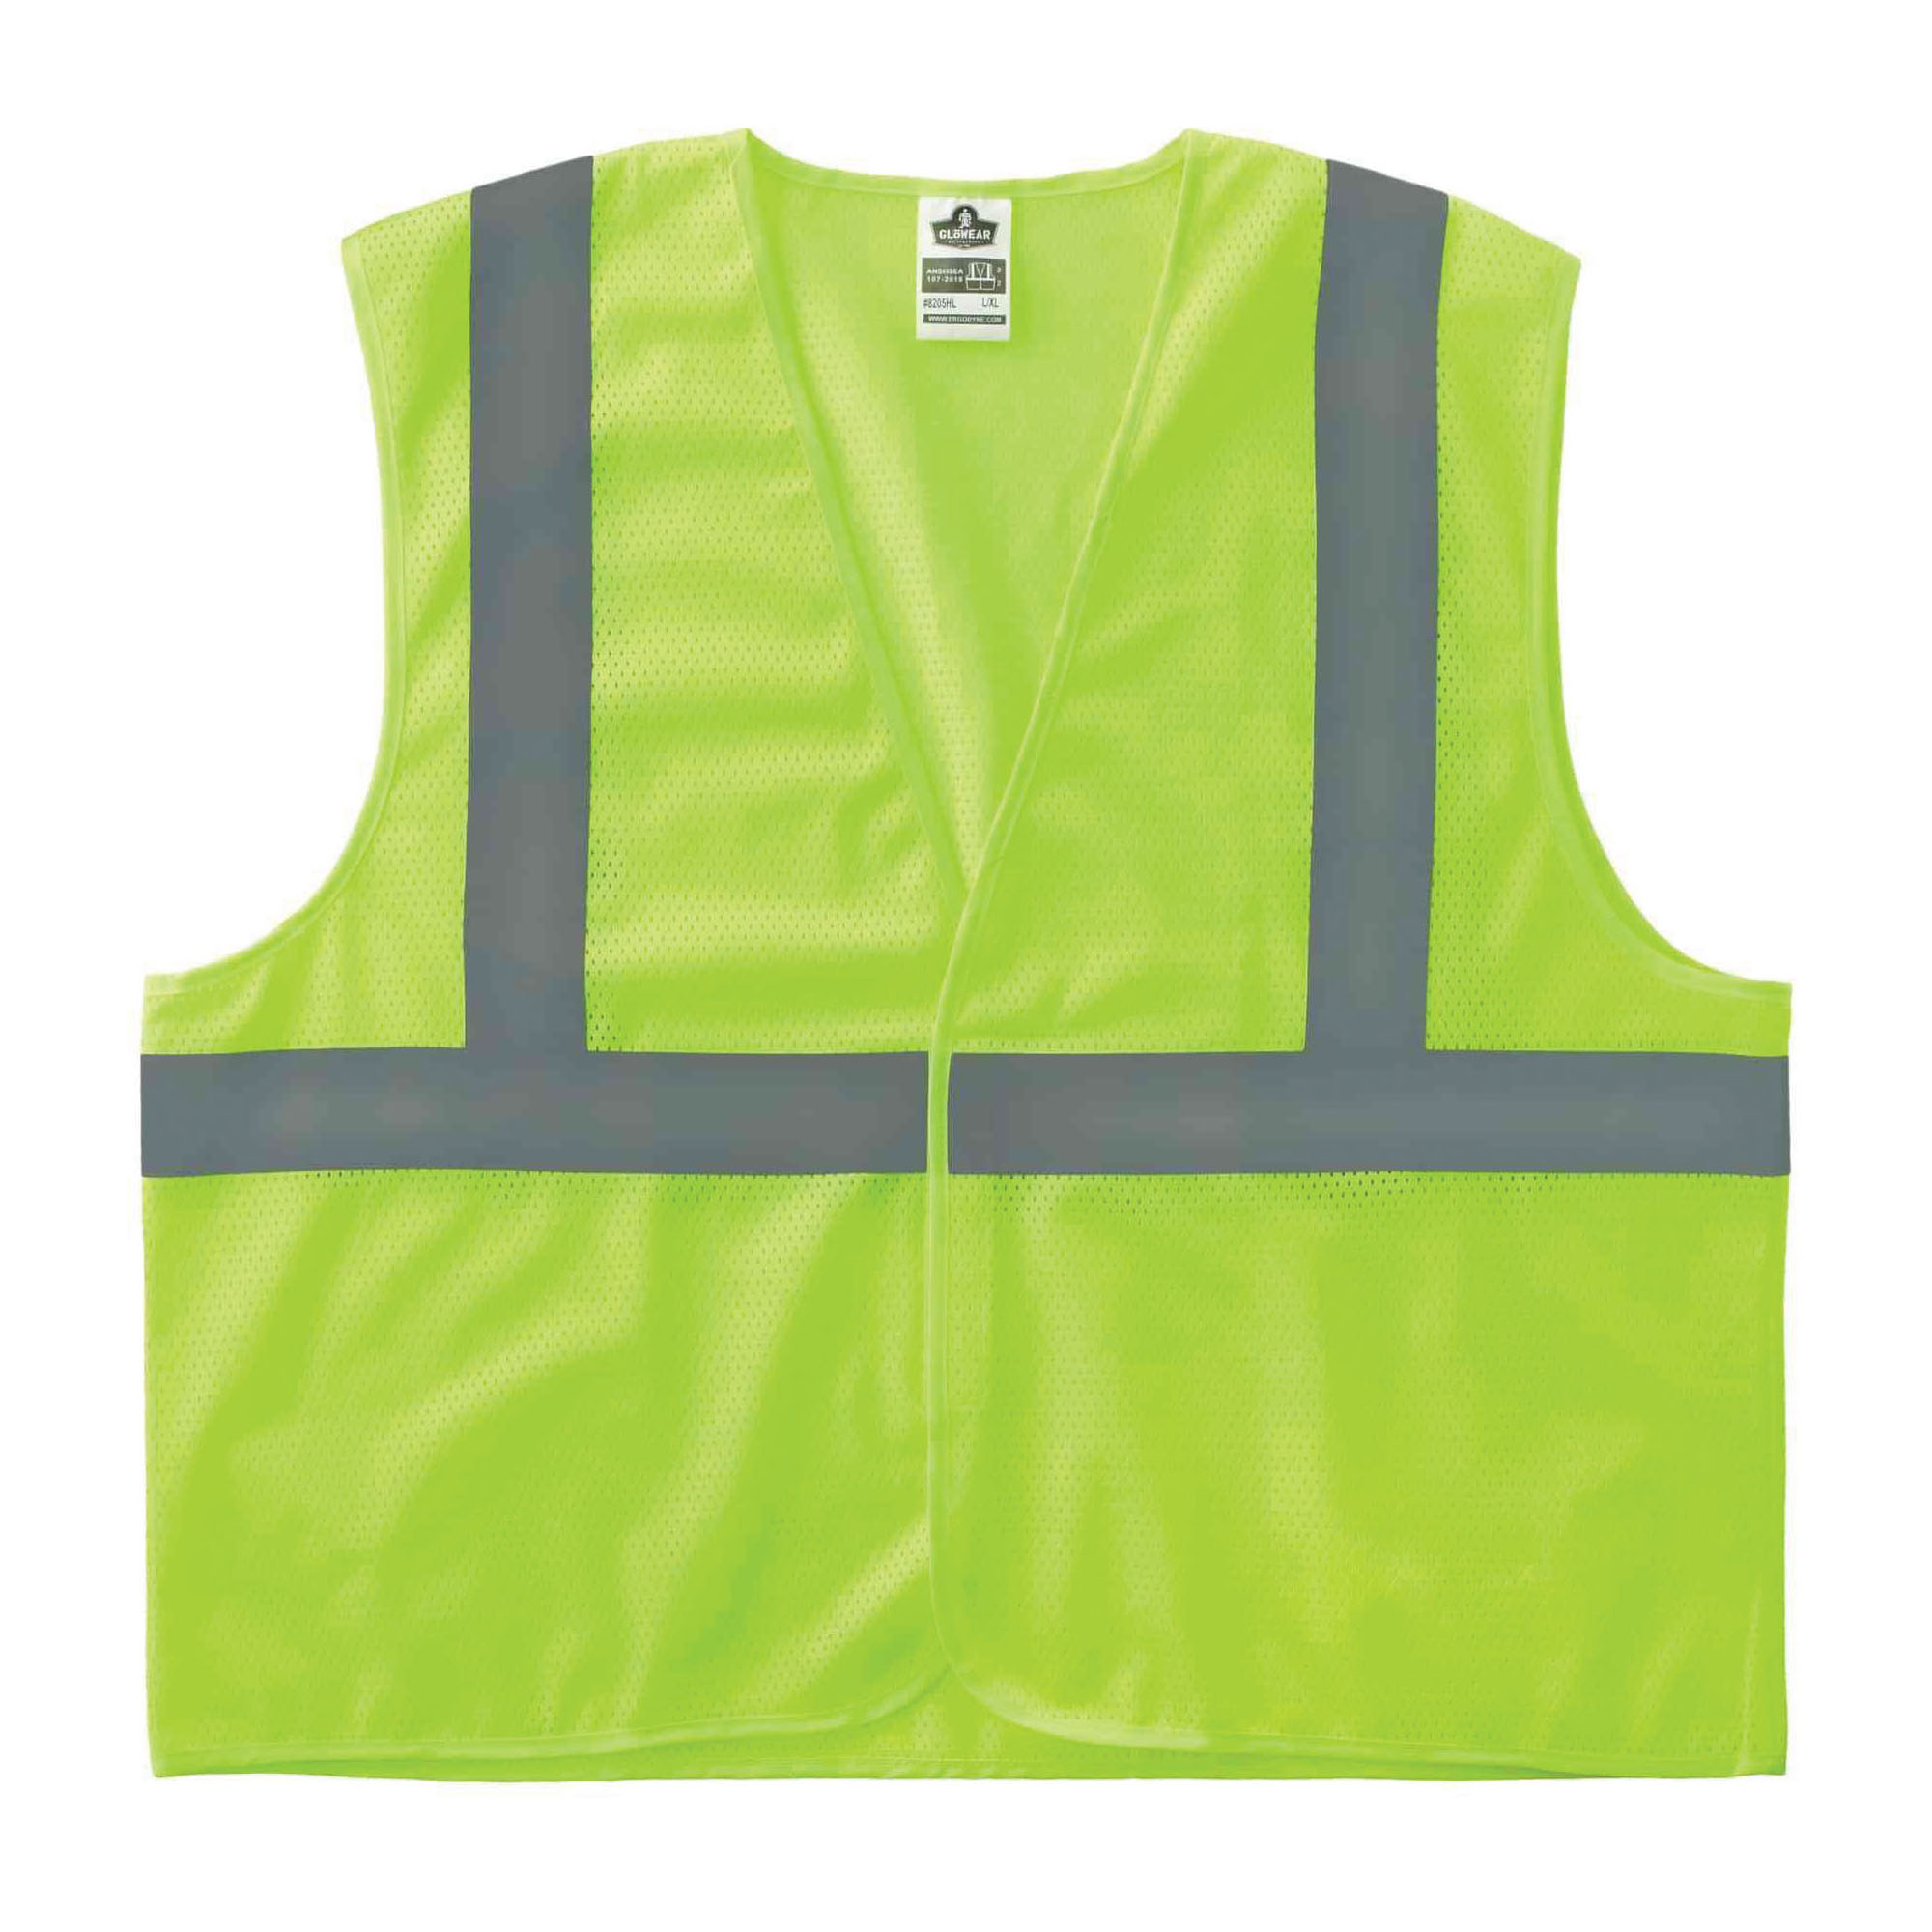 Ergodyne® GloWear® 8205HL Super Econo Vest, Hi-Viz Orange, Polyester Mesh, Hook and Loop Closure, ANSI Class: Class 2, Specifications Met: ANSI/ISEA 107-2015 Type R, Lime or Orange, Various Sizes